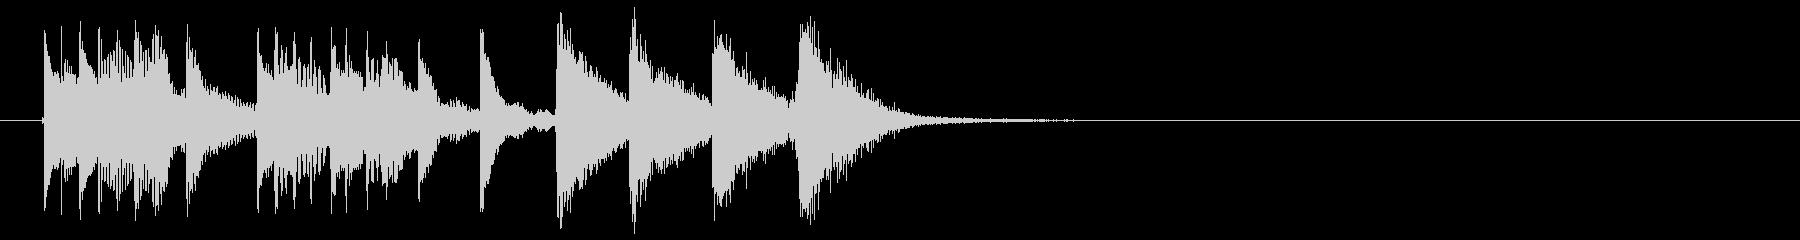 Marimba's simple jingle's unreproduced waveform